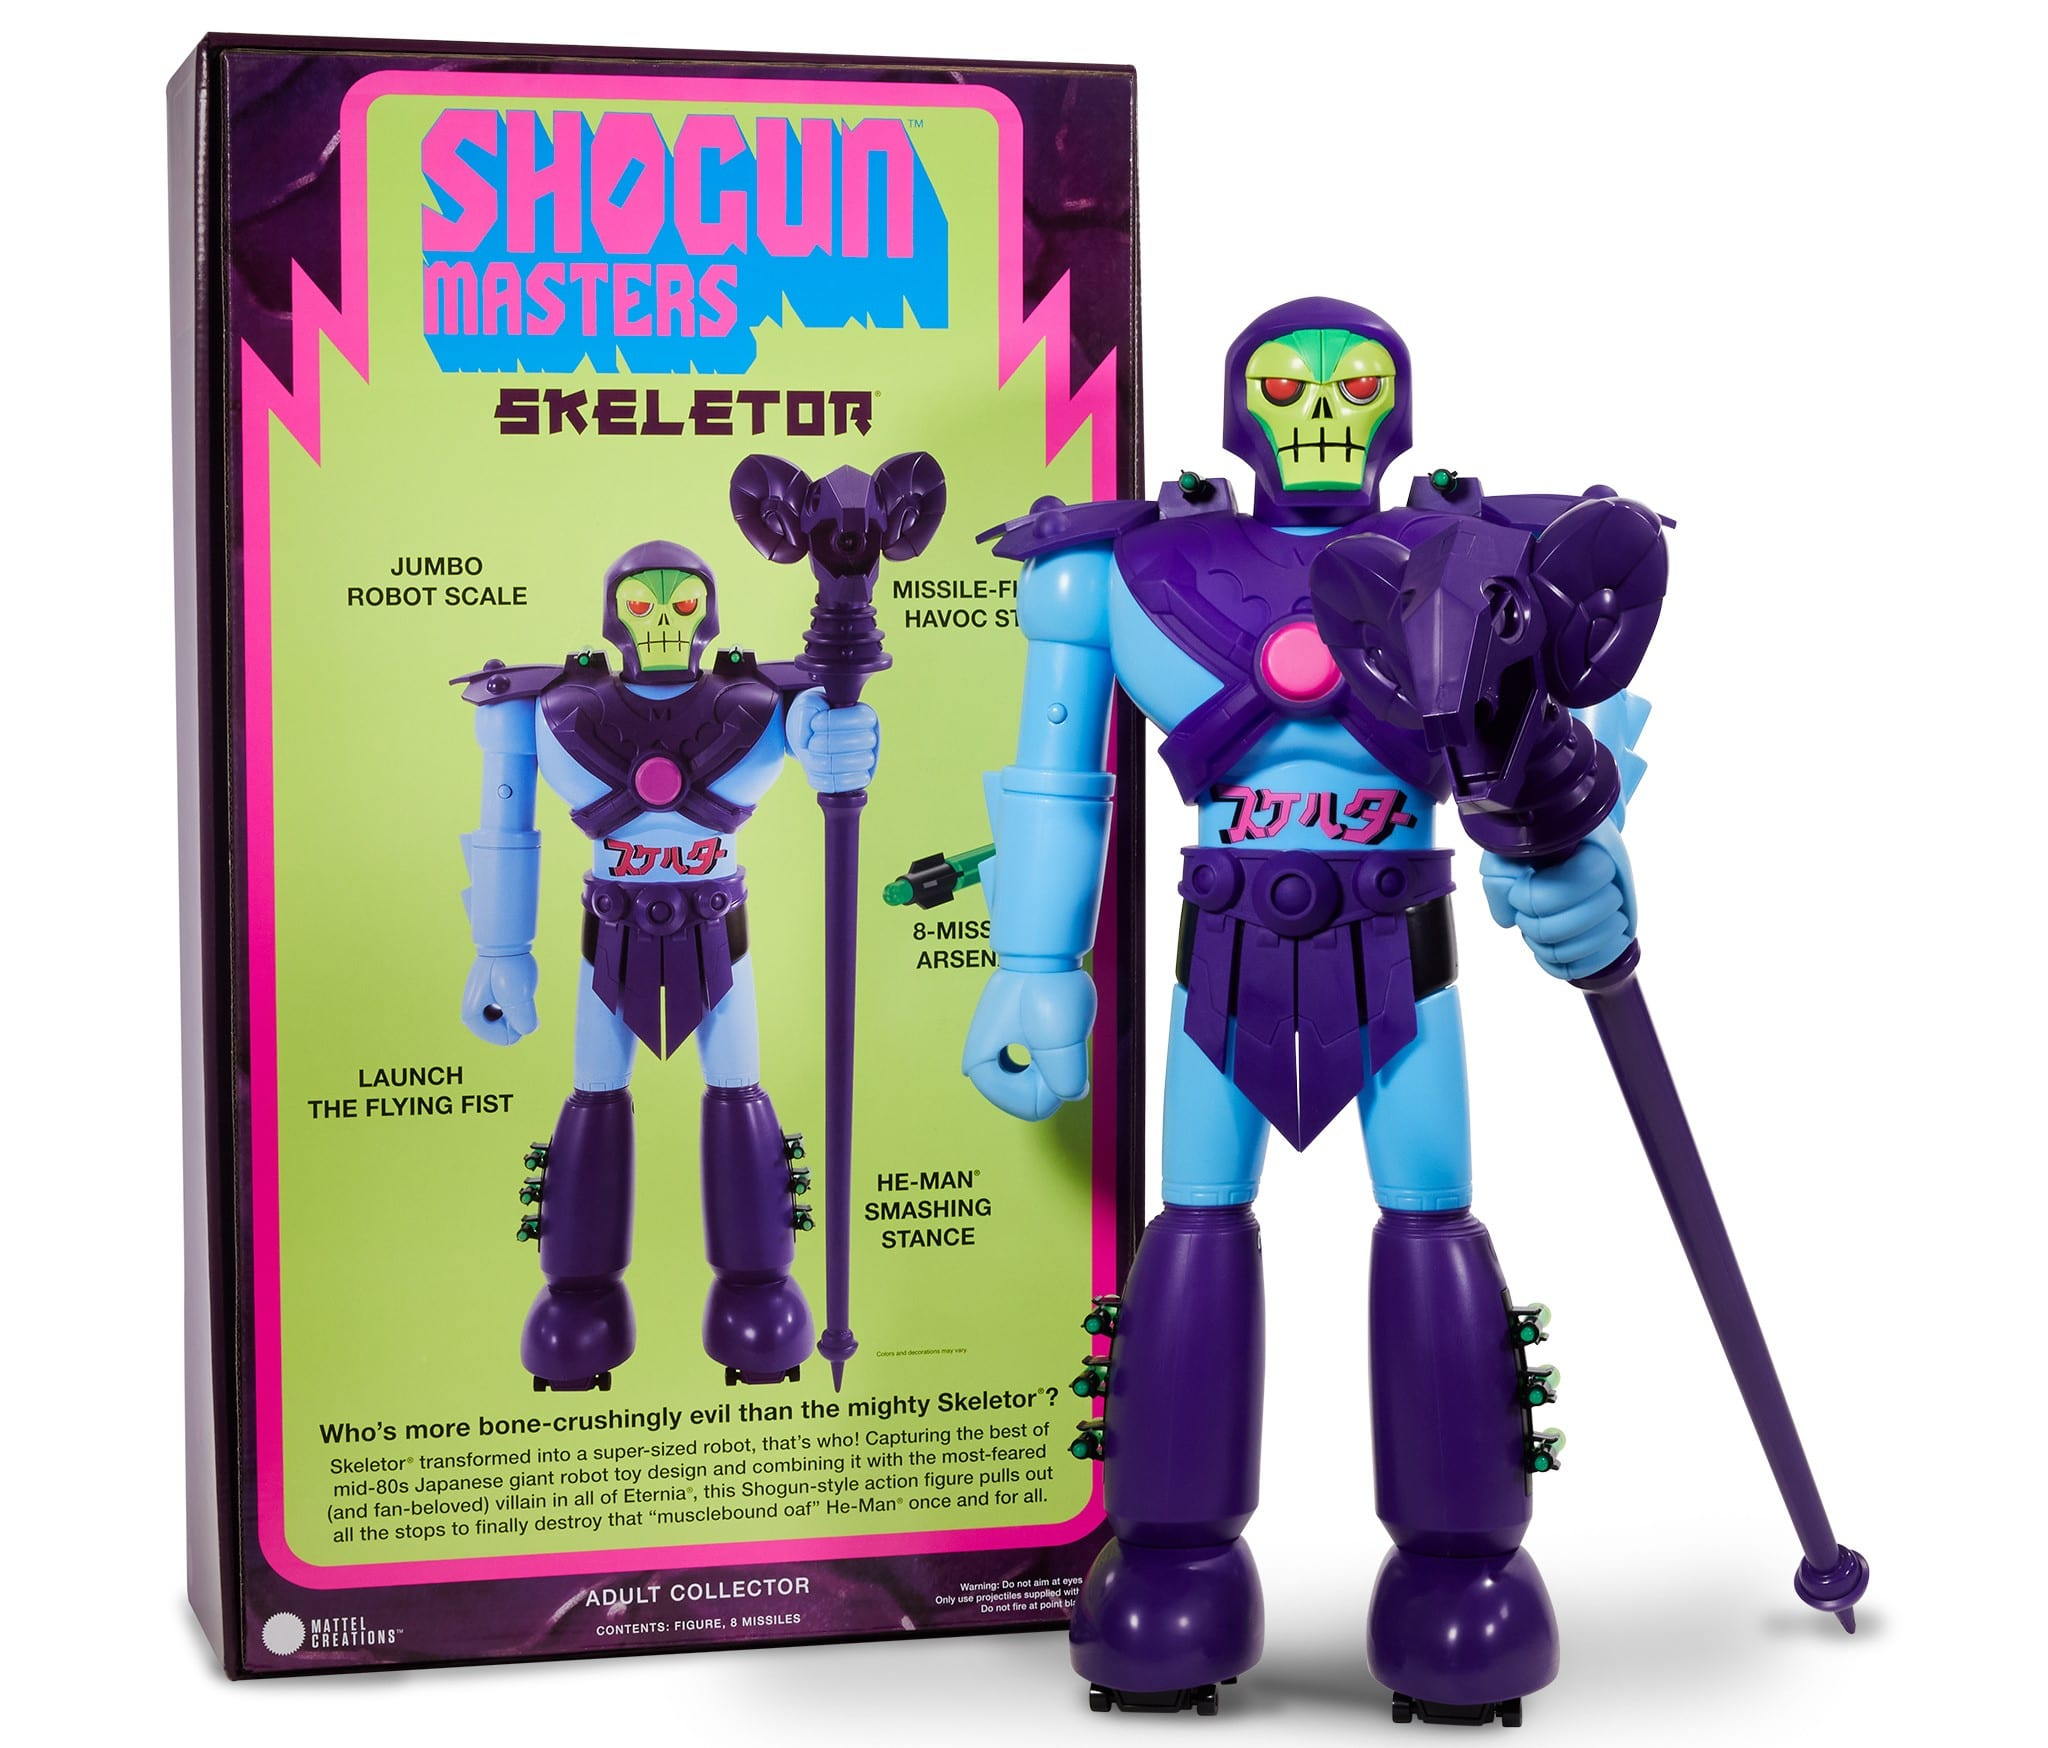 Masters of the Universe villain Skeletor gets a Shogun Warrior action figure 14